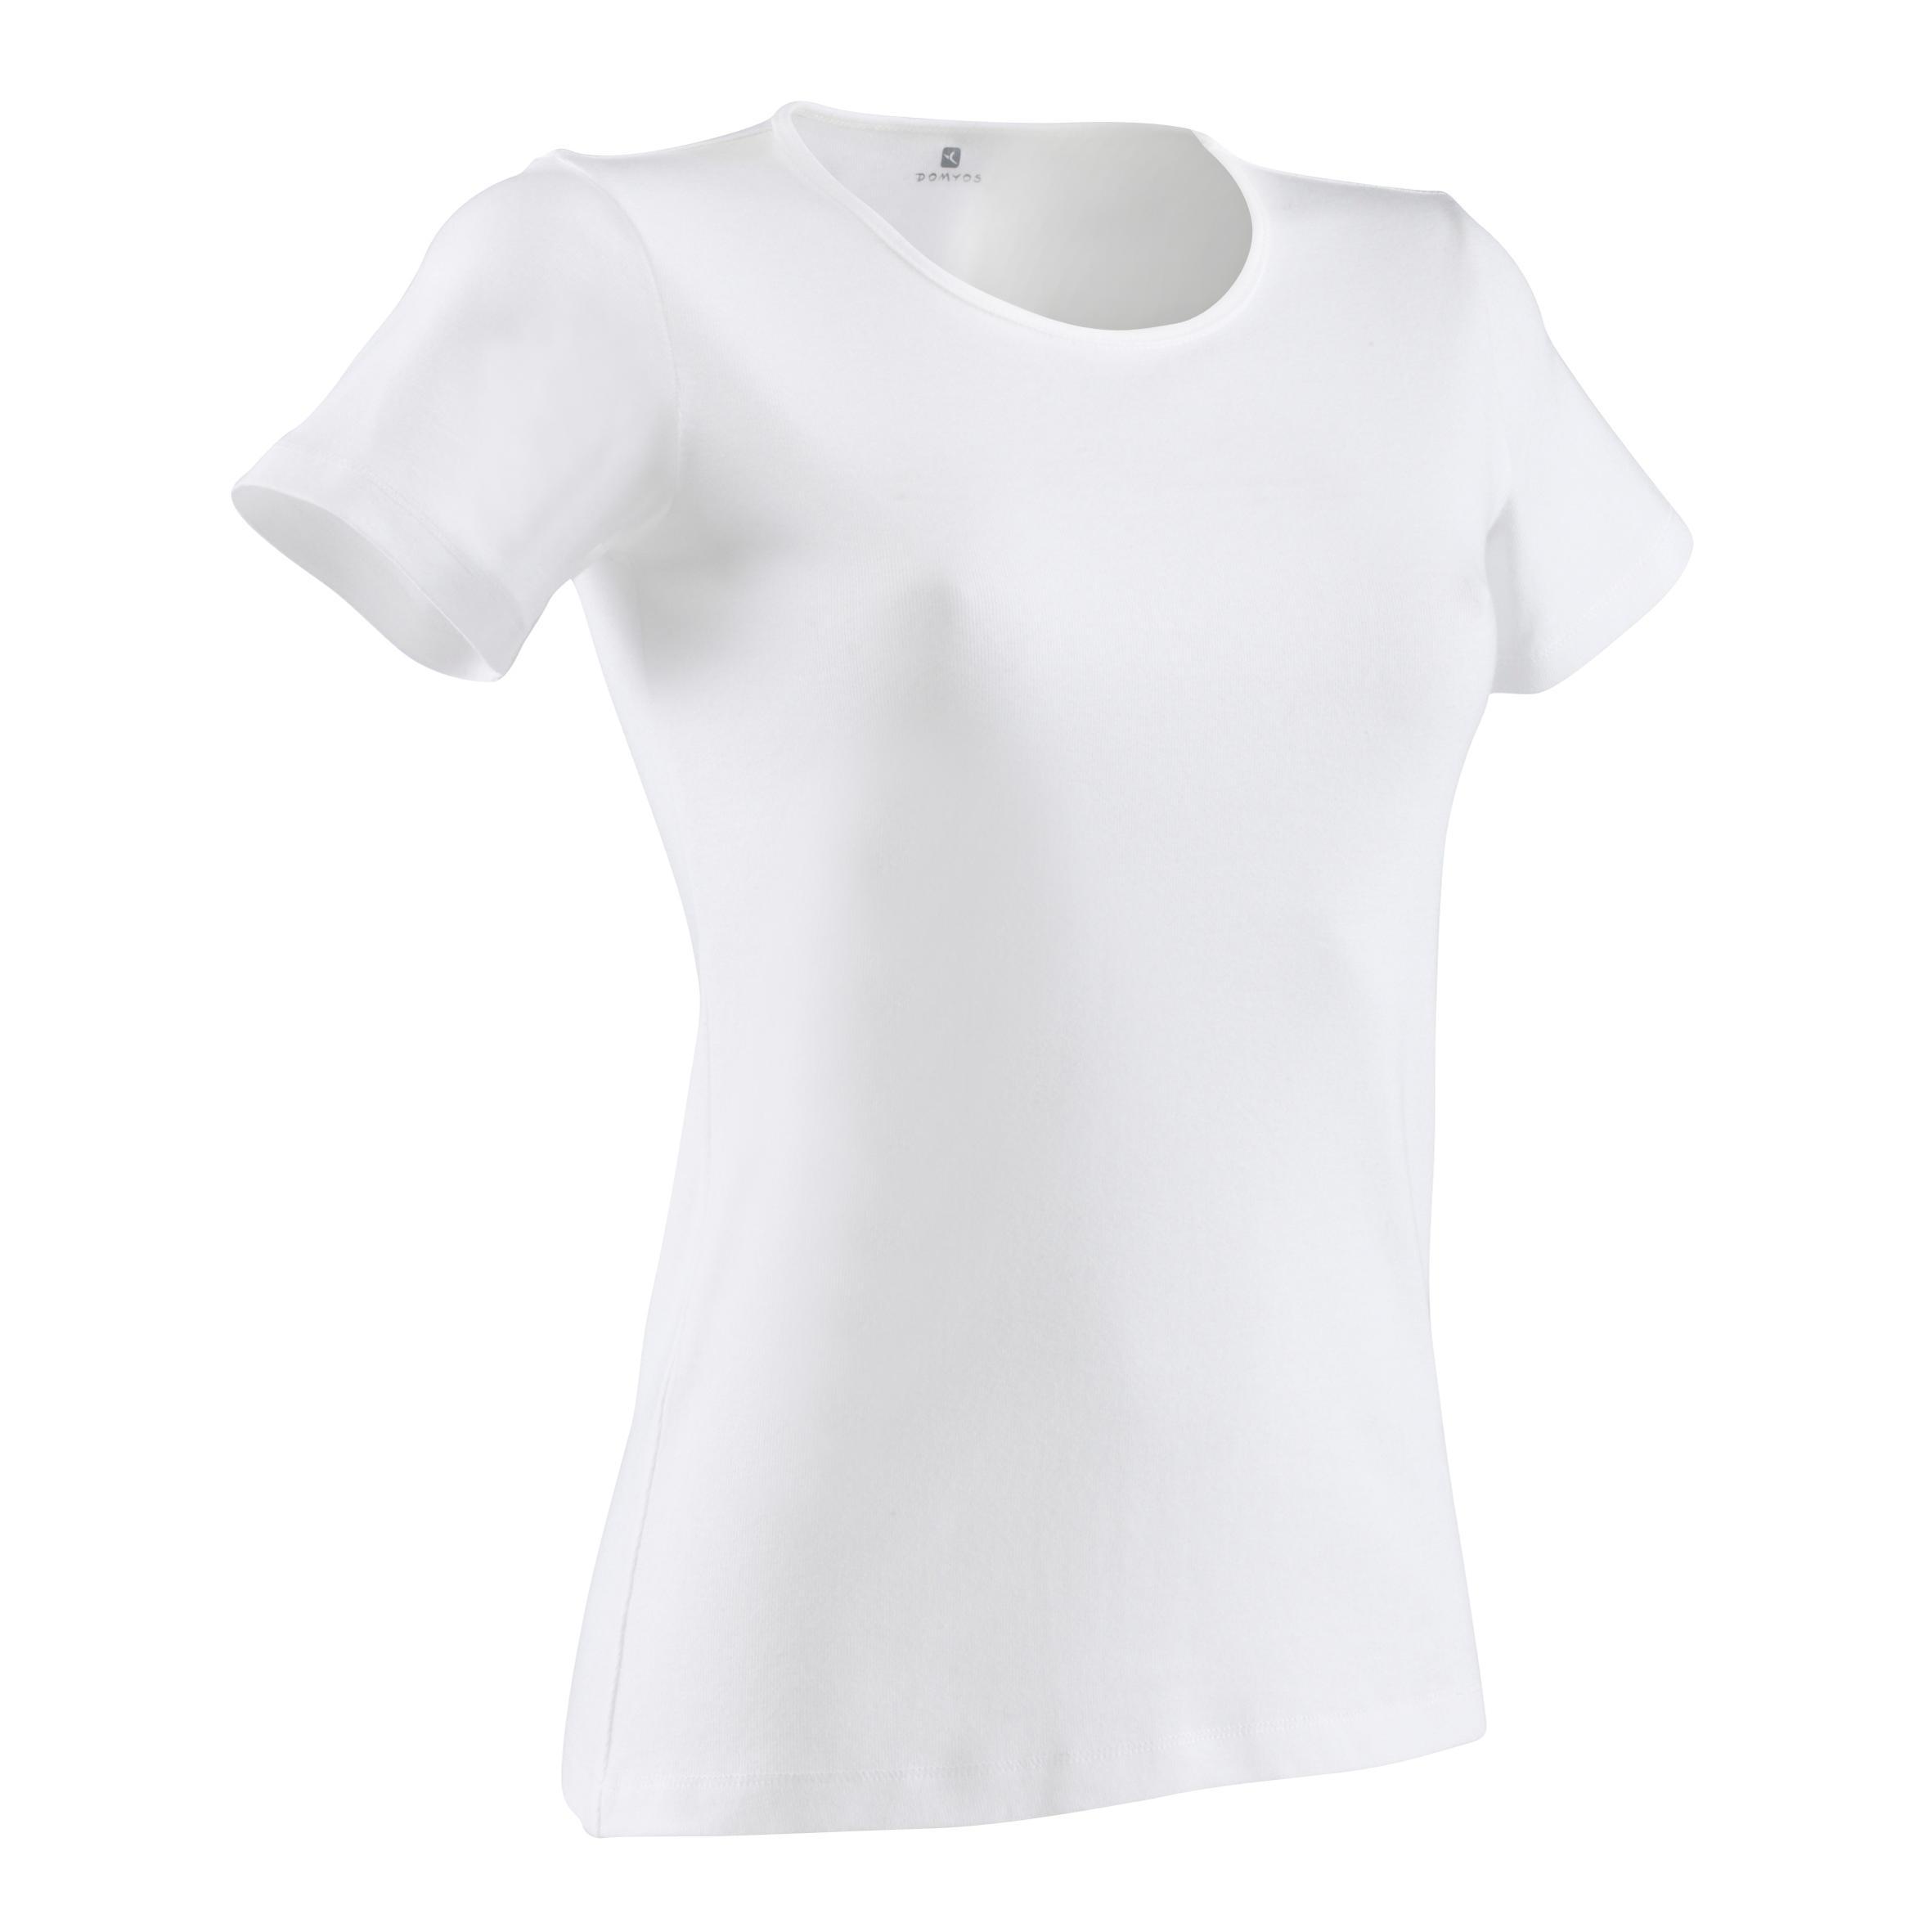 a98c4139bf0 Camiseta Manga Corta Gimnasia Pilates Domyos Sportee 100 Mujer Blanco Domyos